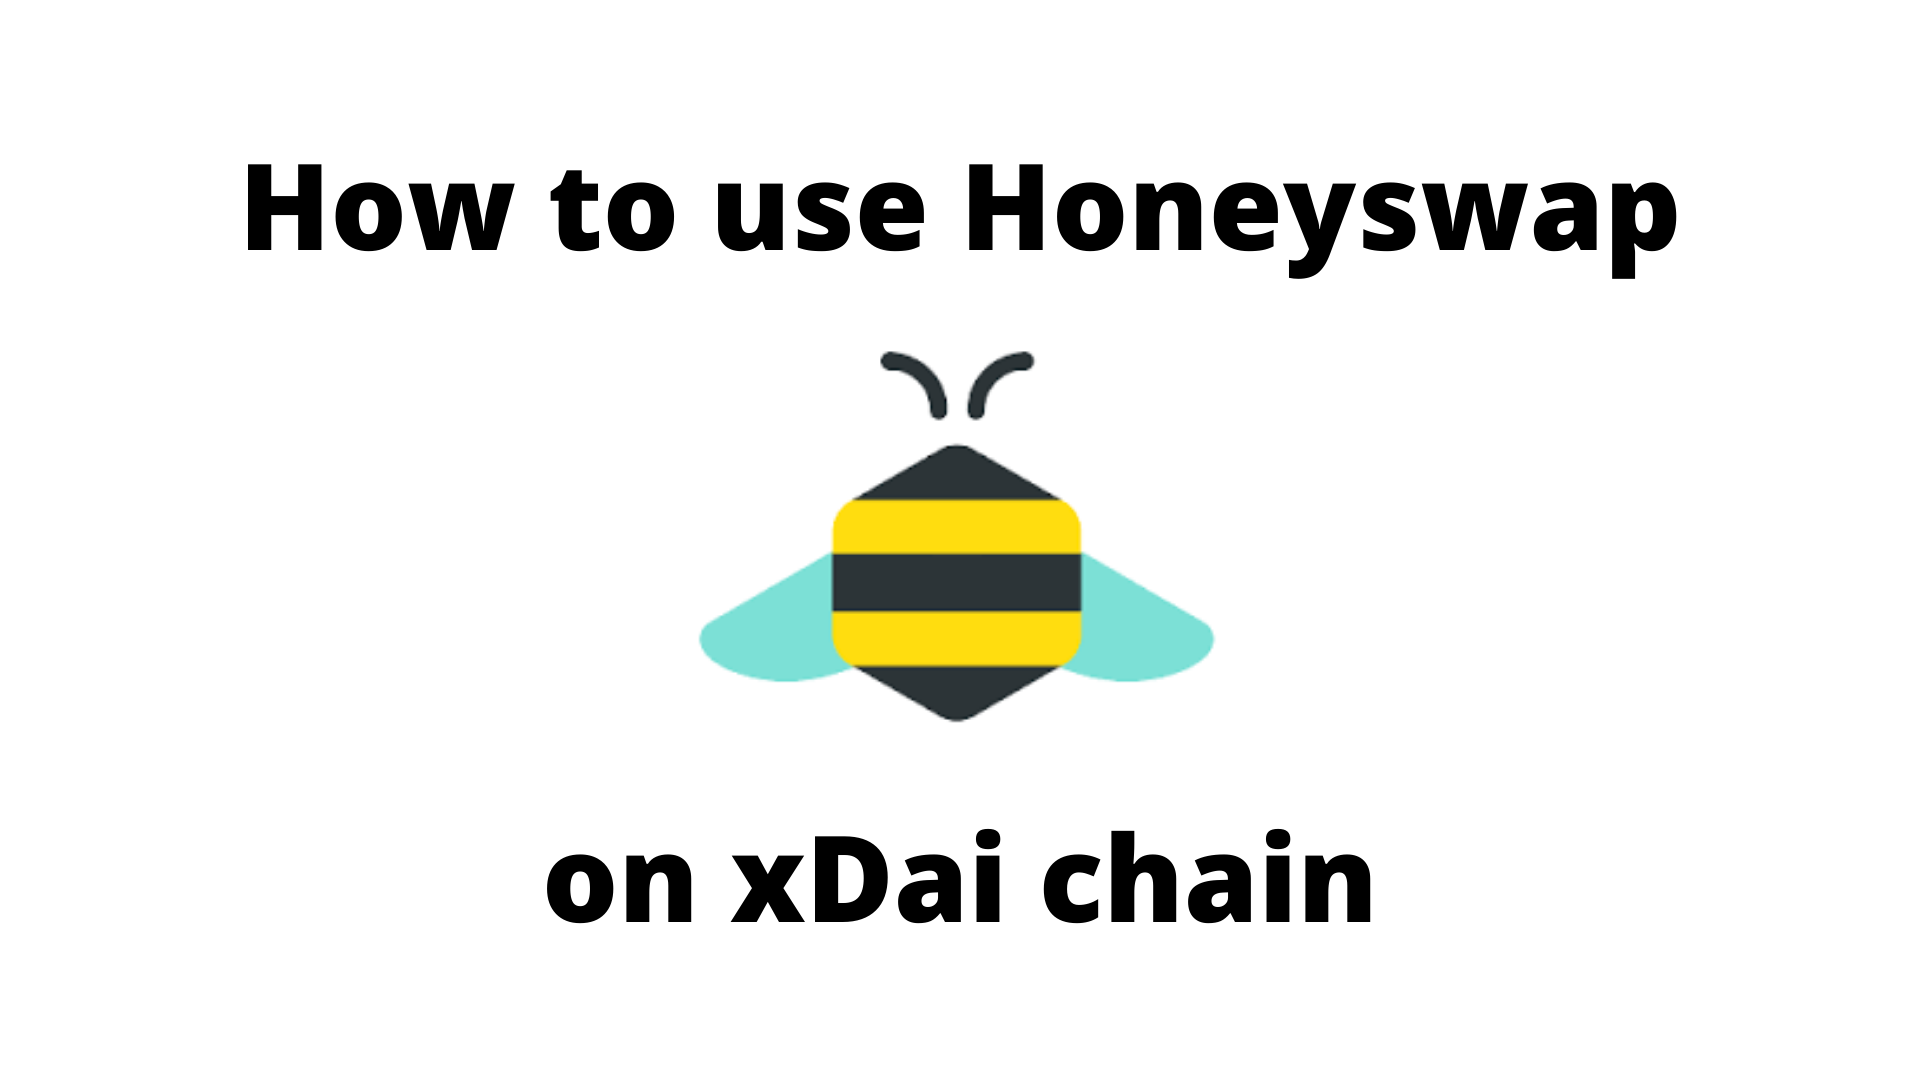 How to Use Honeyswap to Provide Liquidity